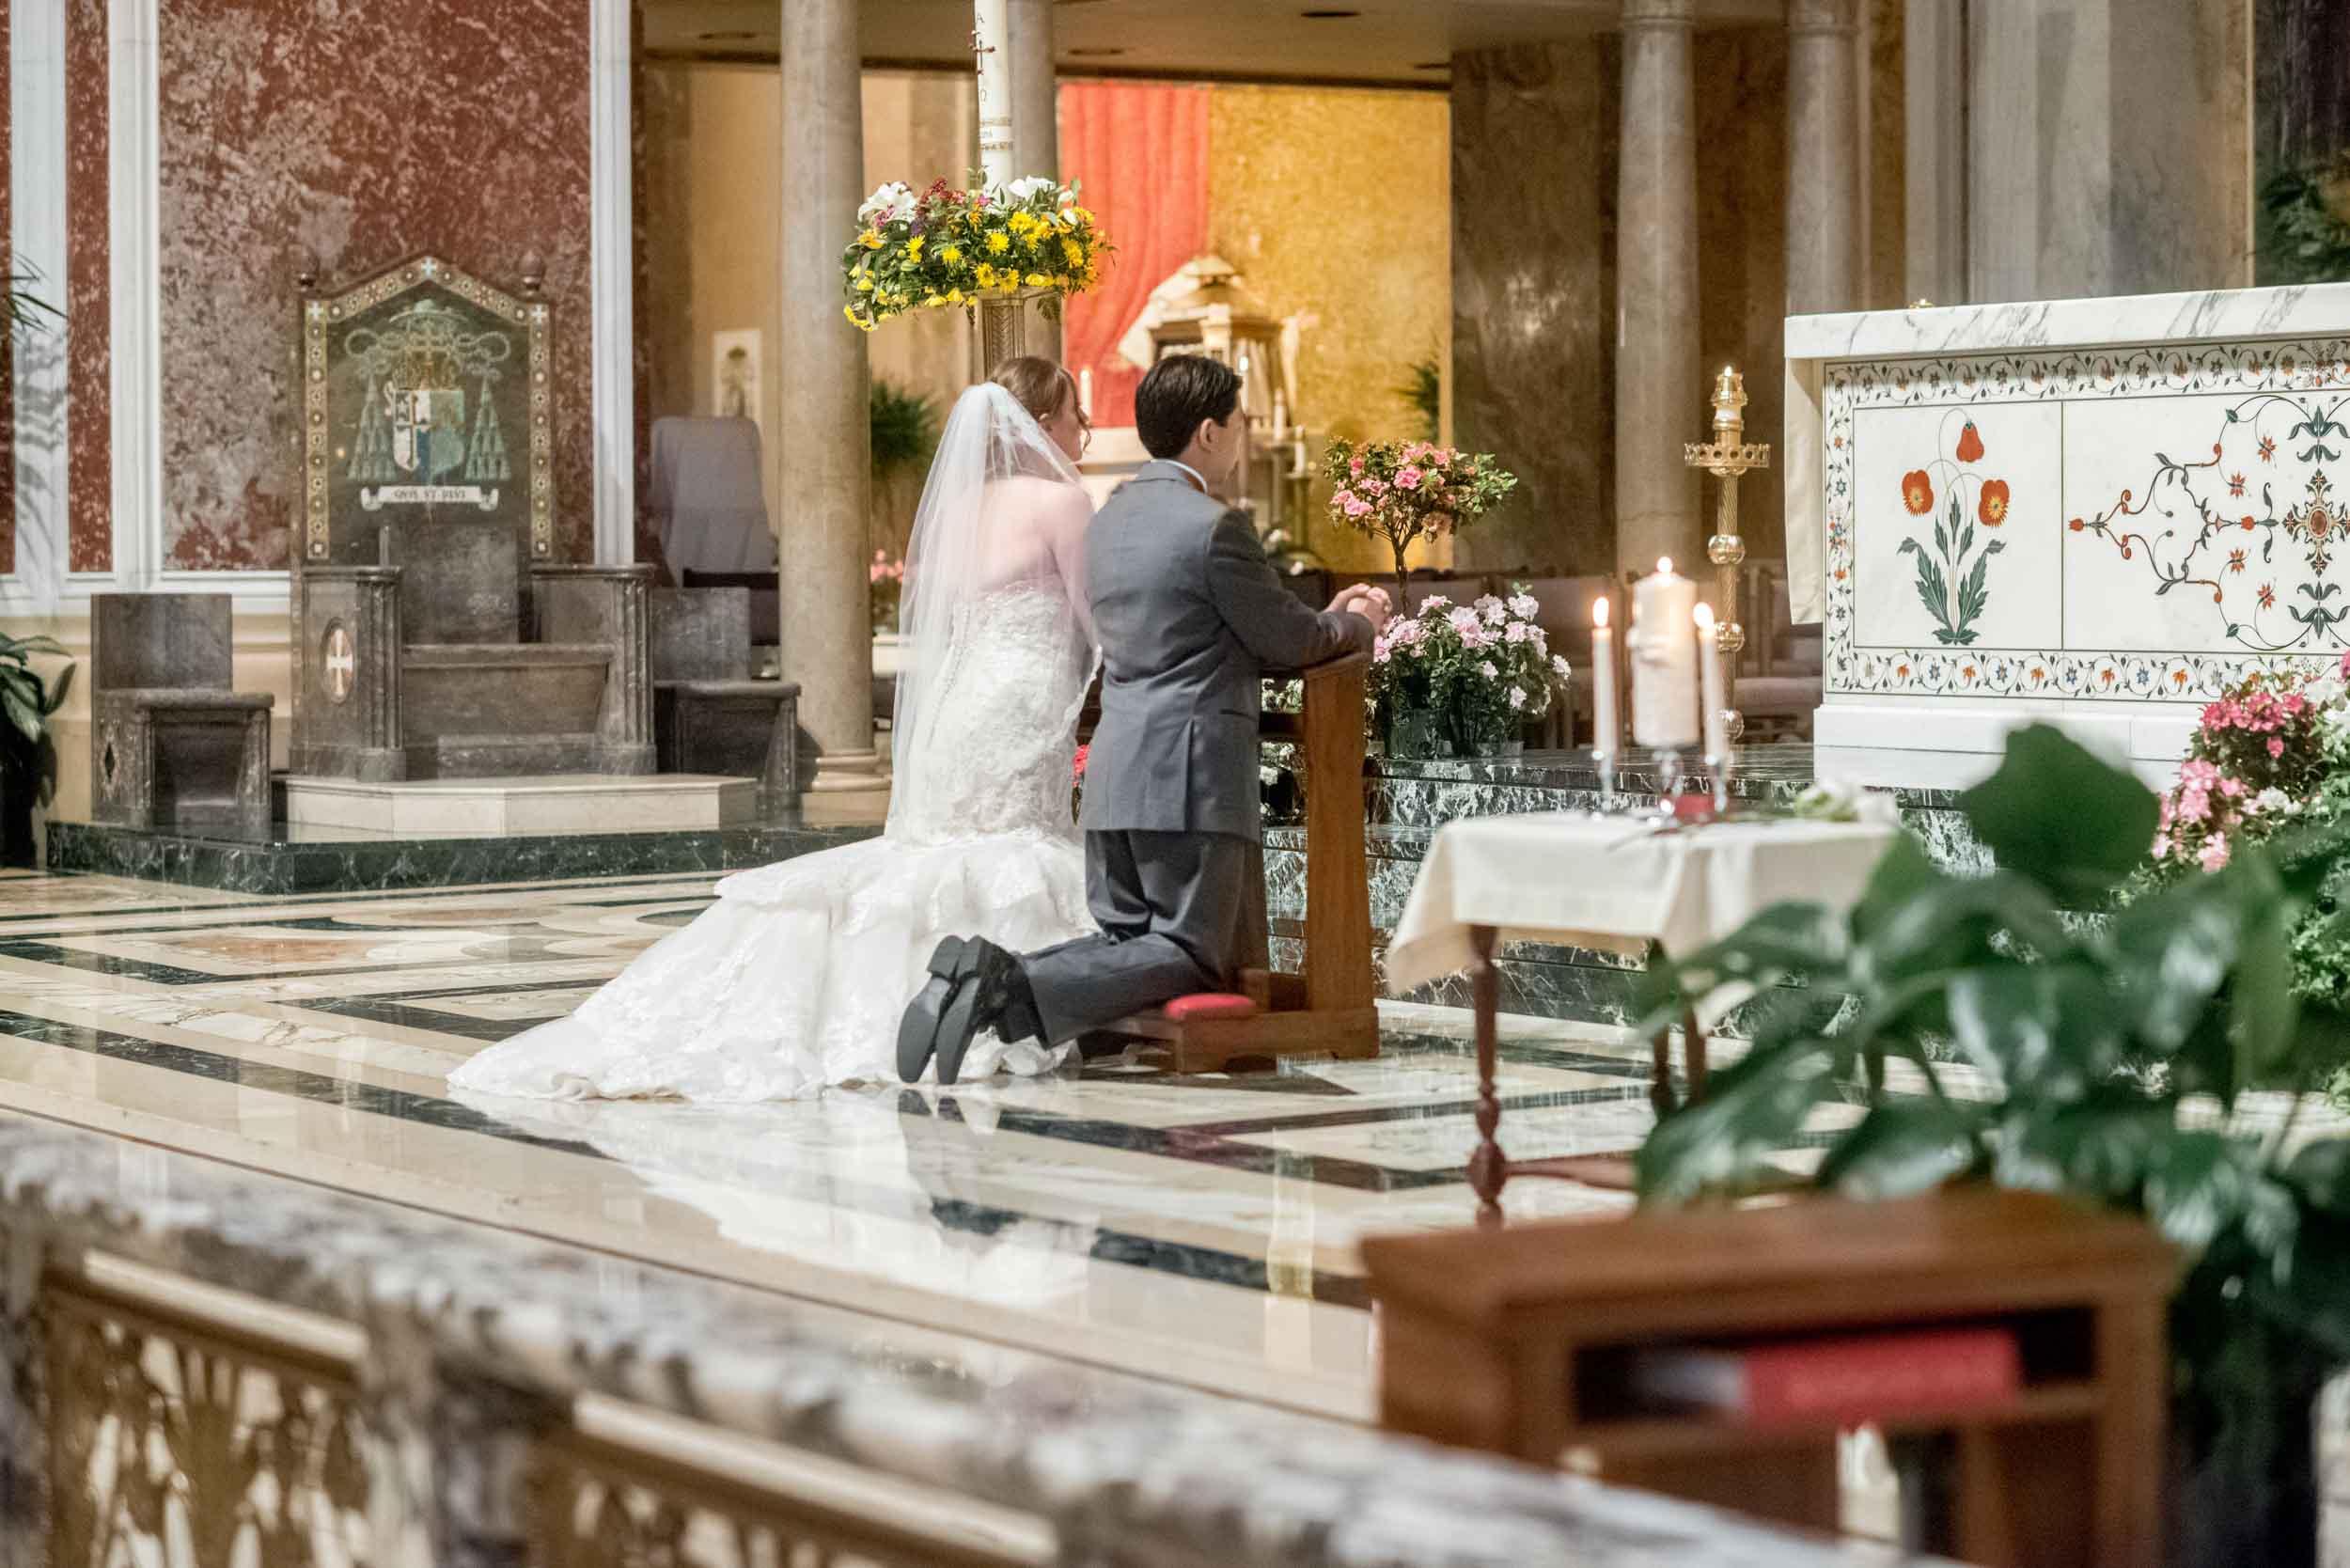 dc+metro+wedding+photographer+vadym+guliuk+photography+wedding+ceremony-2032.jpg